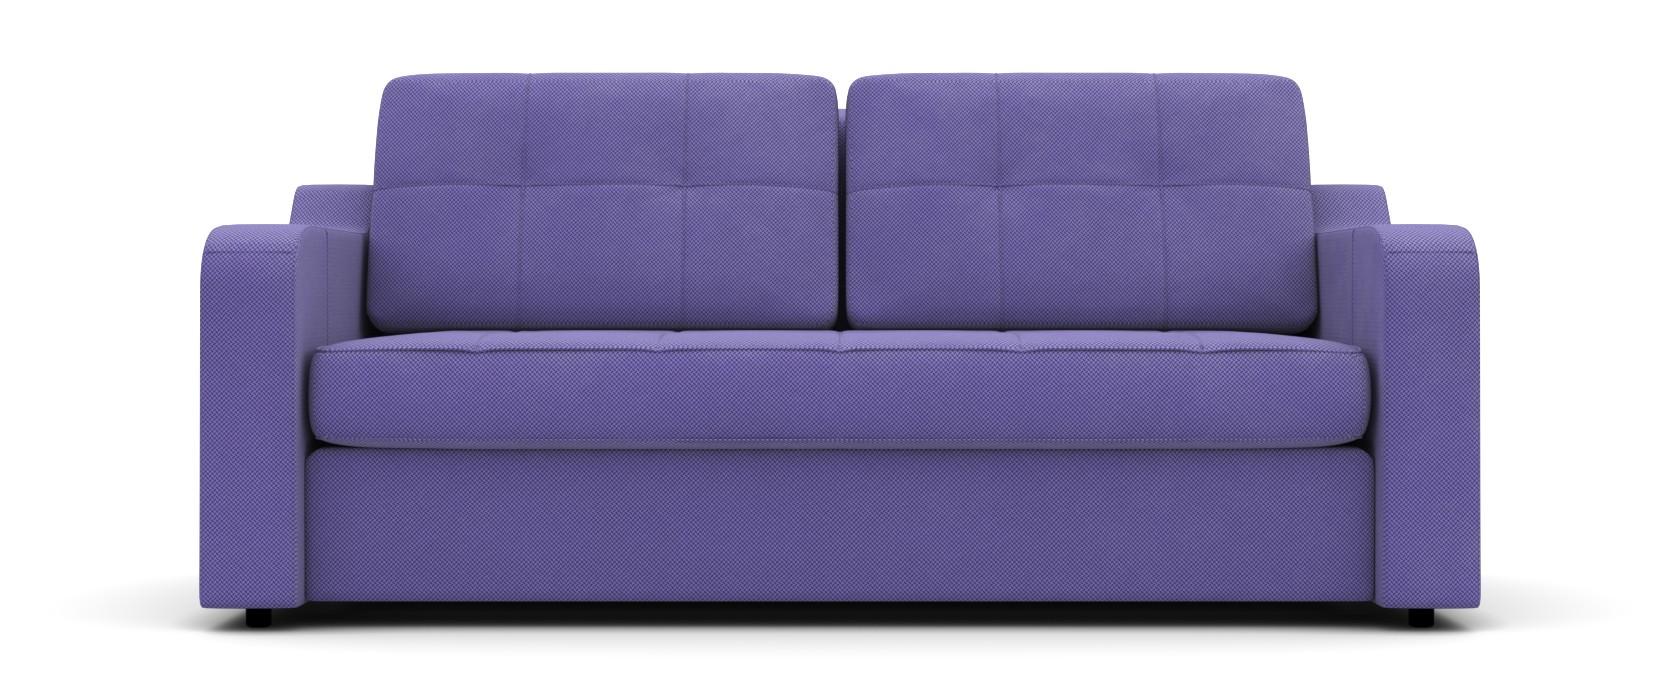 Тримісний диван Vito - Pufetto